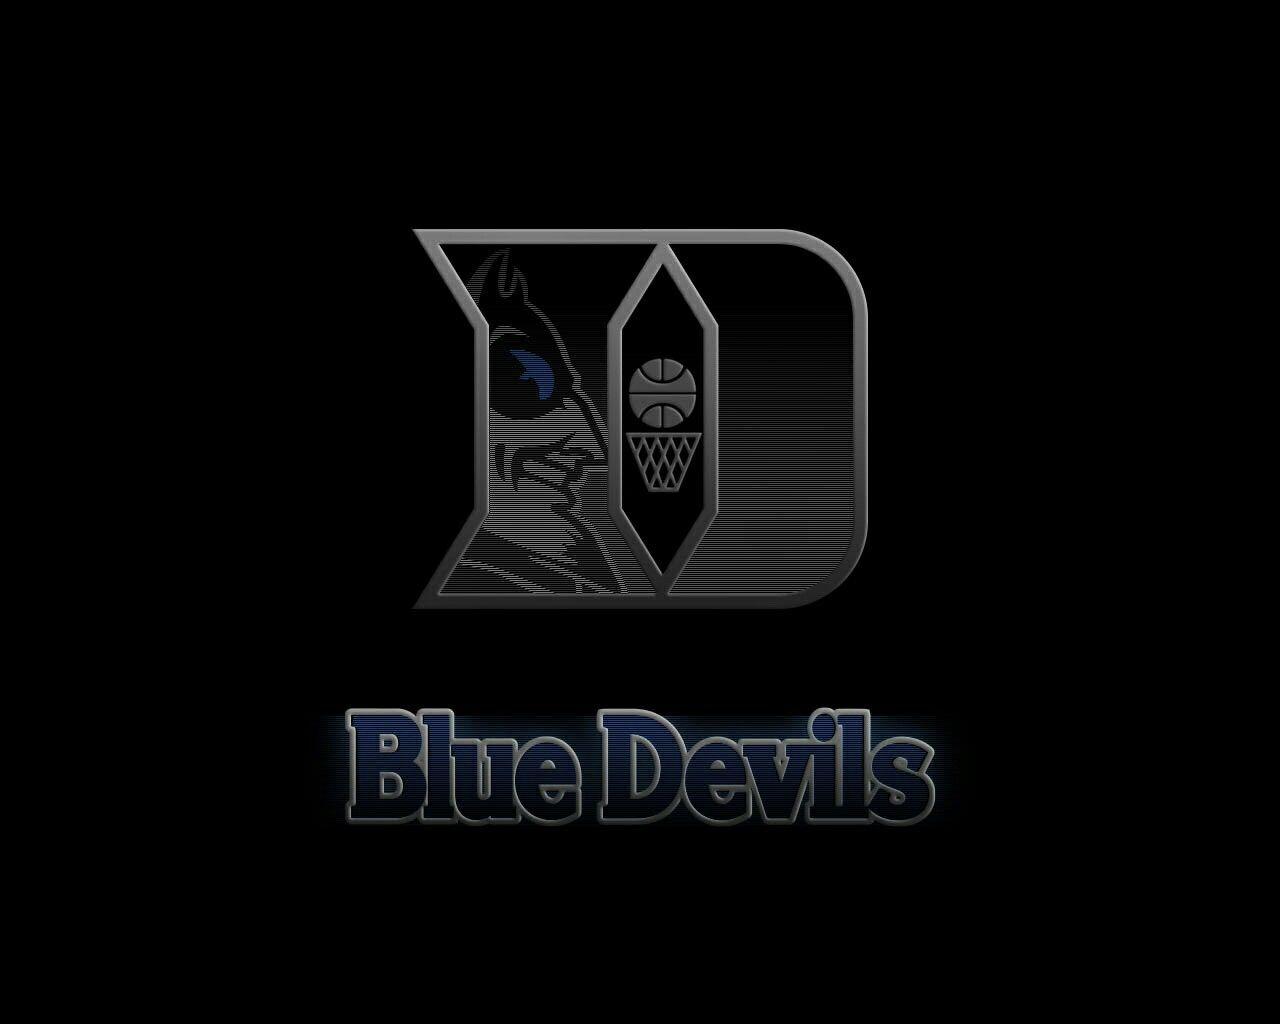 ec7d14a1dc1 Pin by Krystal Carver on Duke logos